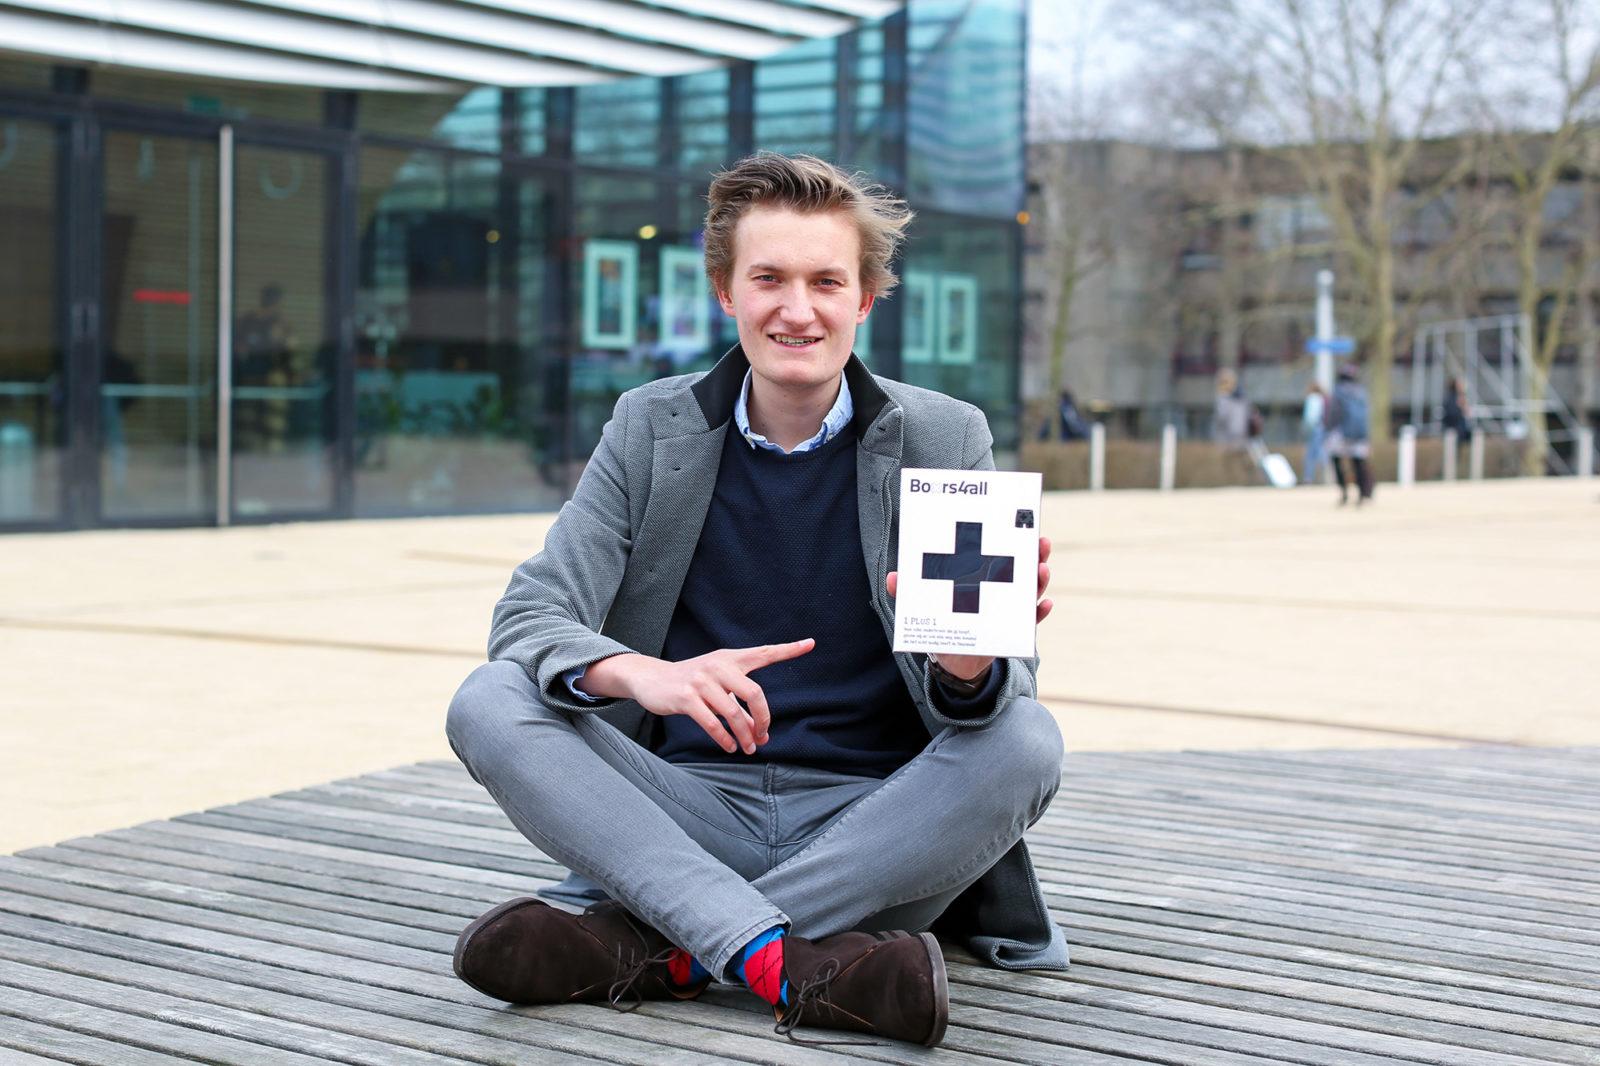 Thom-Uildriks-2-startup-boxrs4all-Sanne-van-der-Most